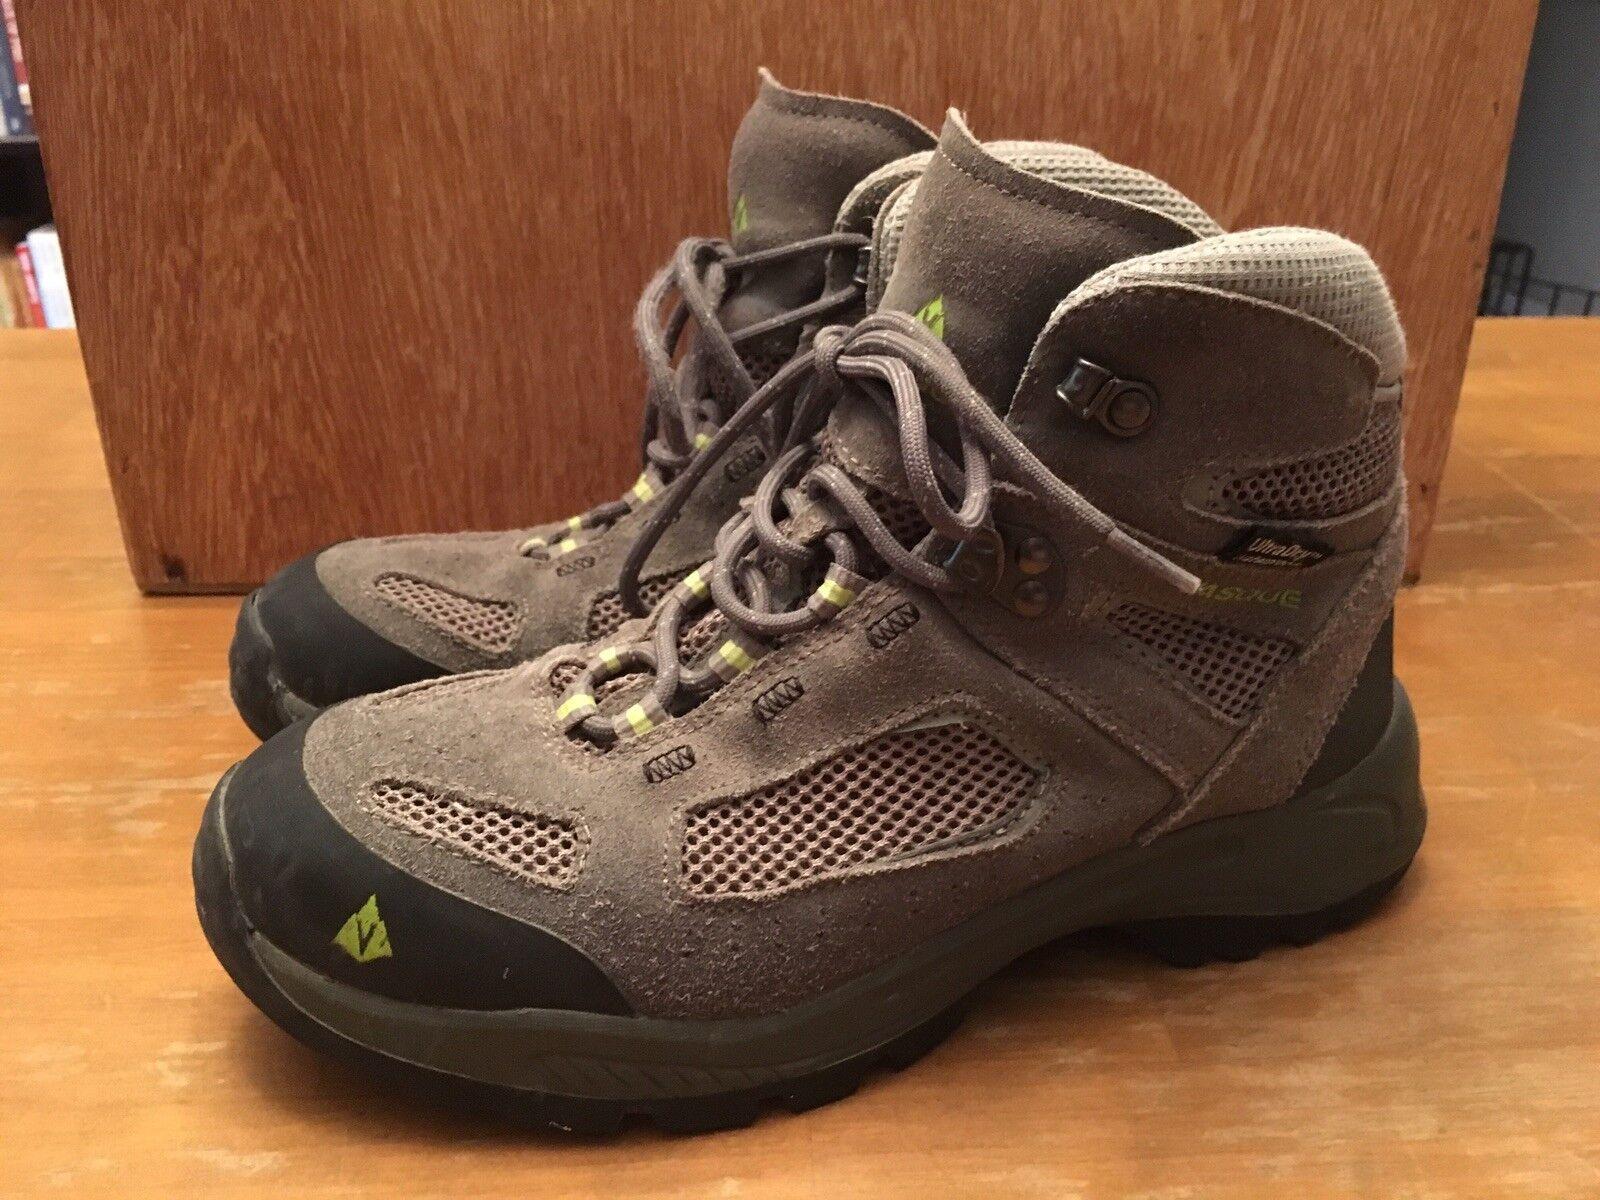 Vasque Waterproof Youth WM's Leather Grey Hiking Boots SZ 6M Y EUC